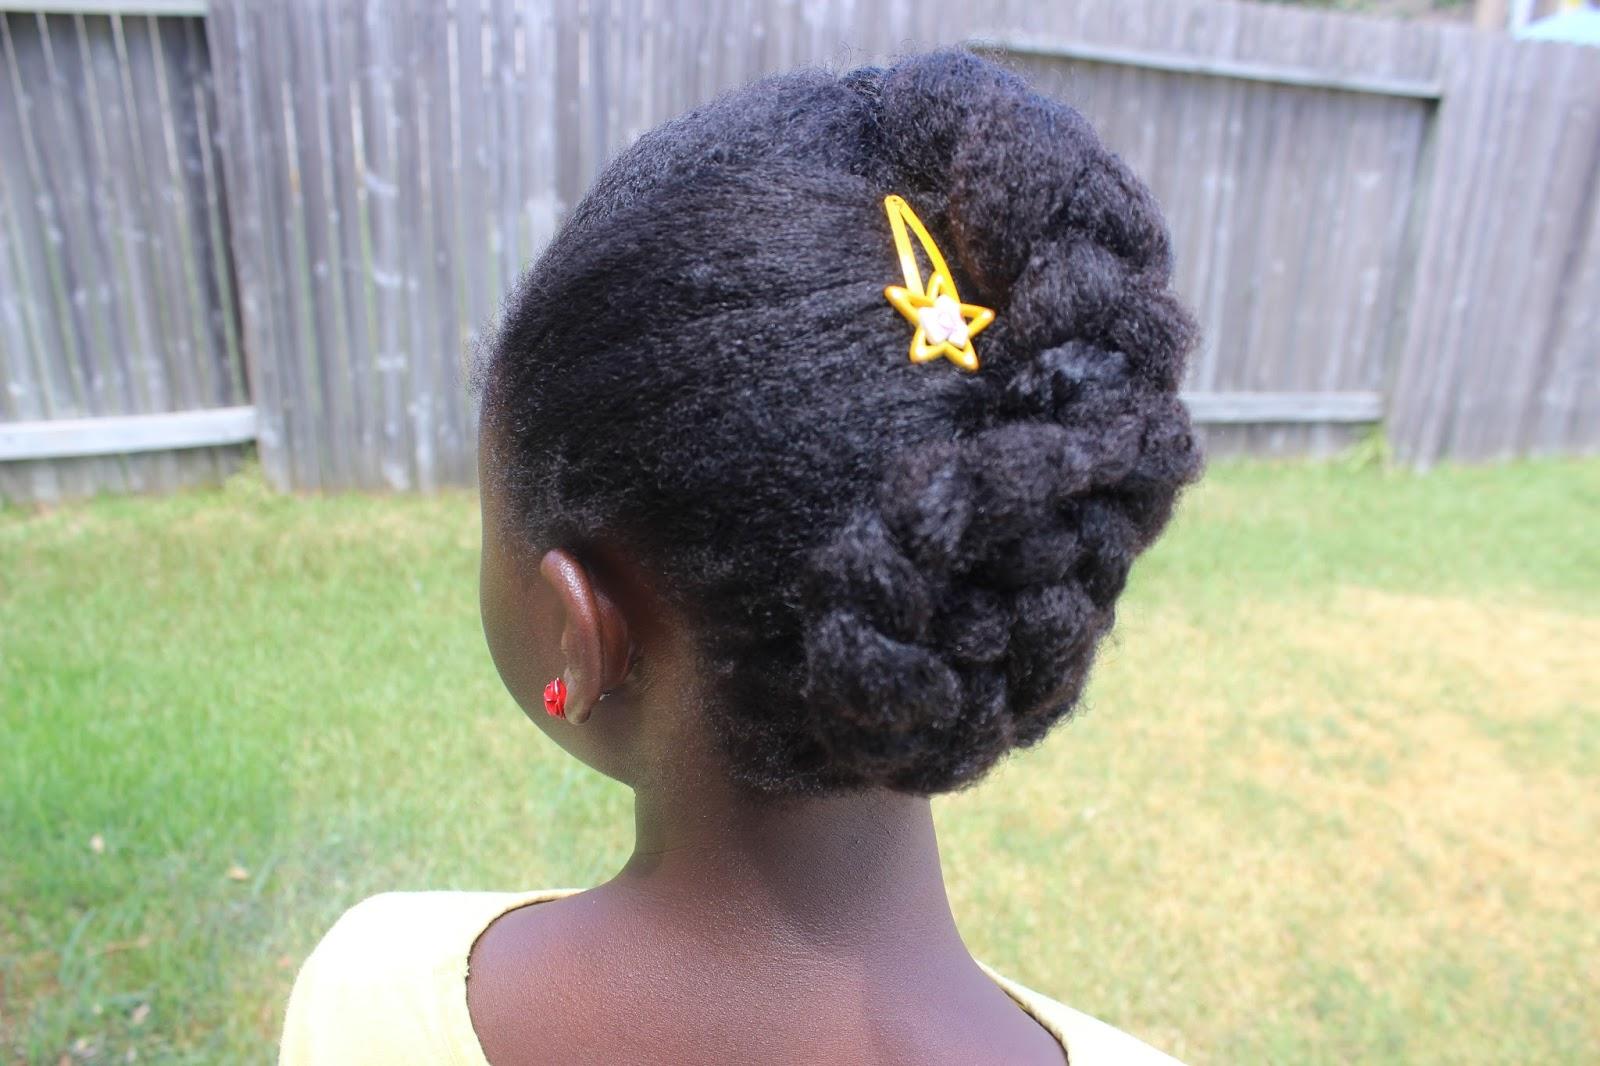 Swell Discoveringnatural Jumbo Braid With Pin Curl On Natural Hair Short Hairstyles Gunalazisus